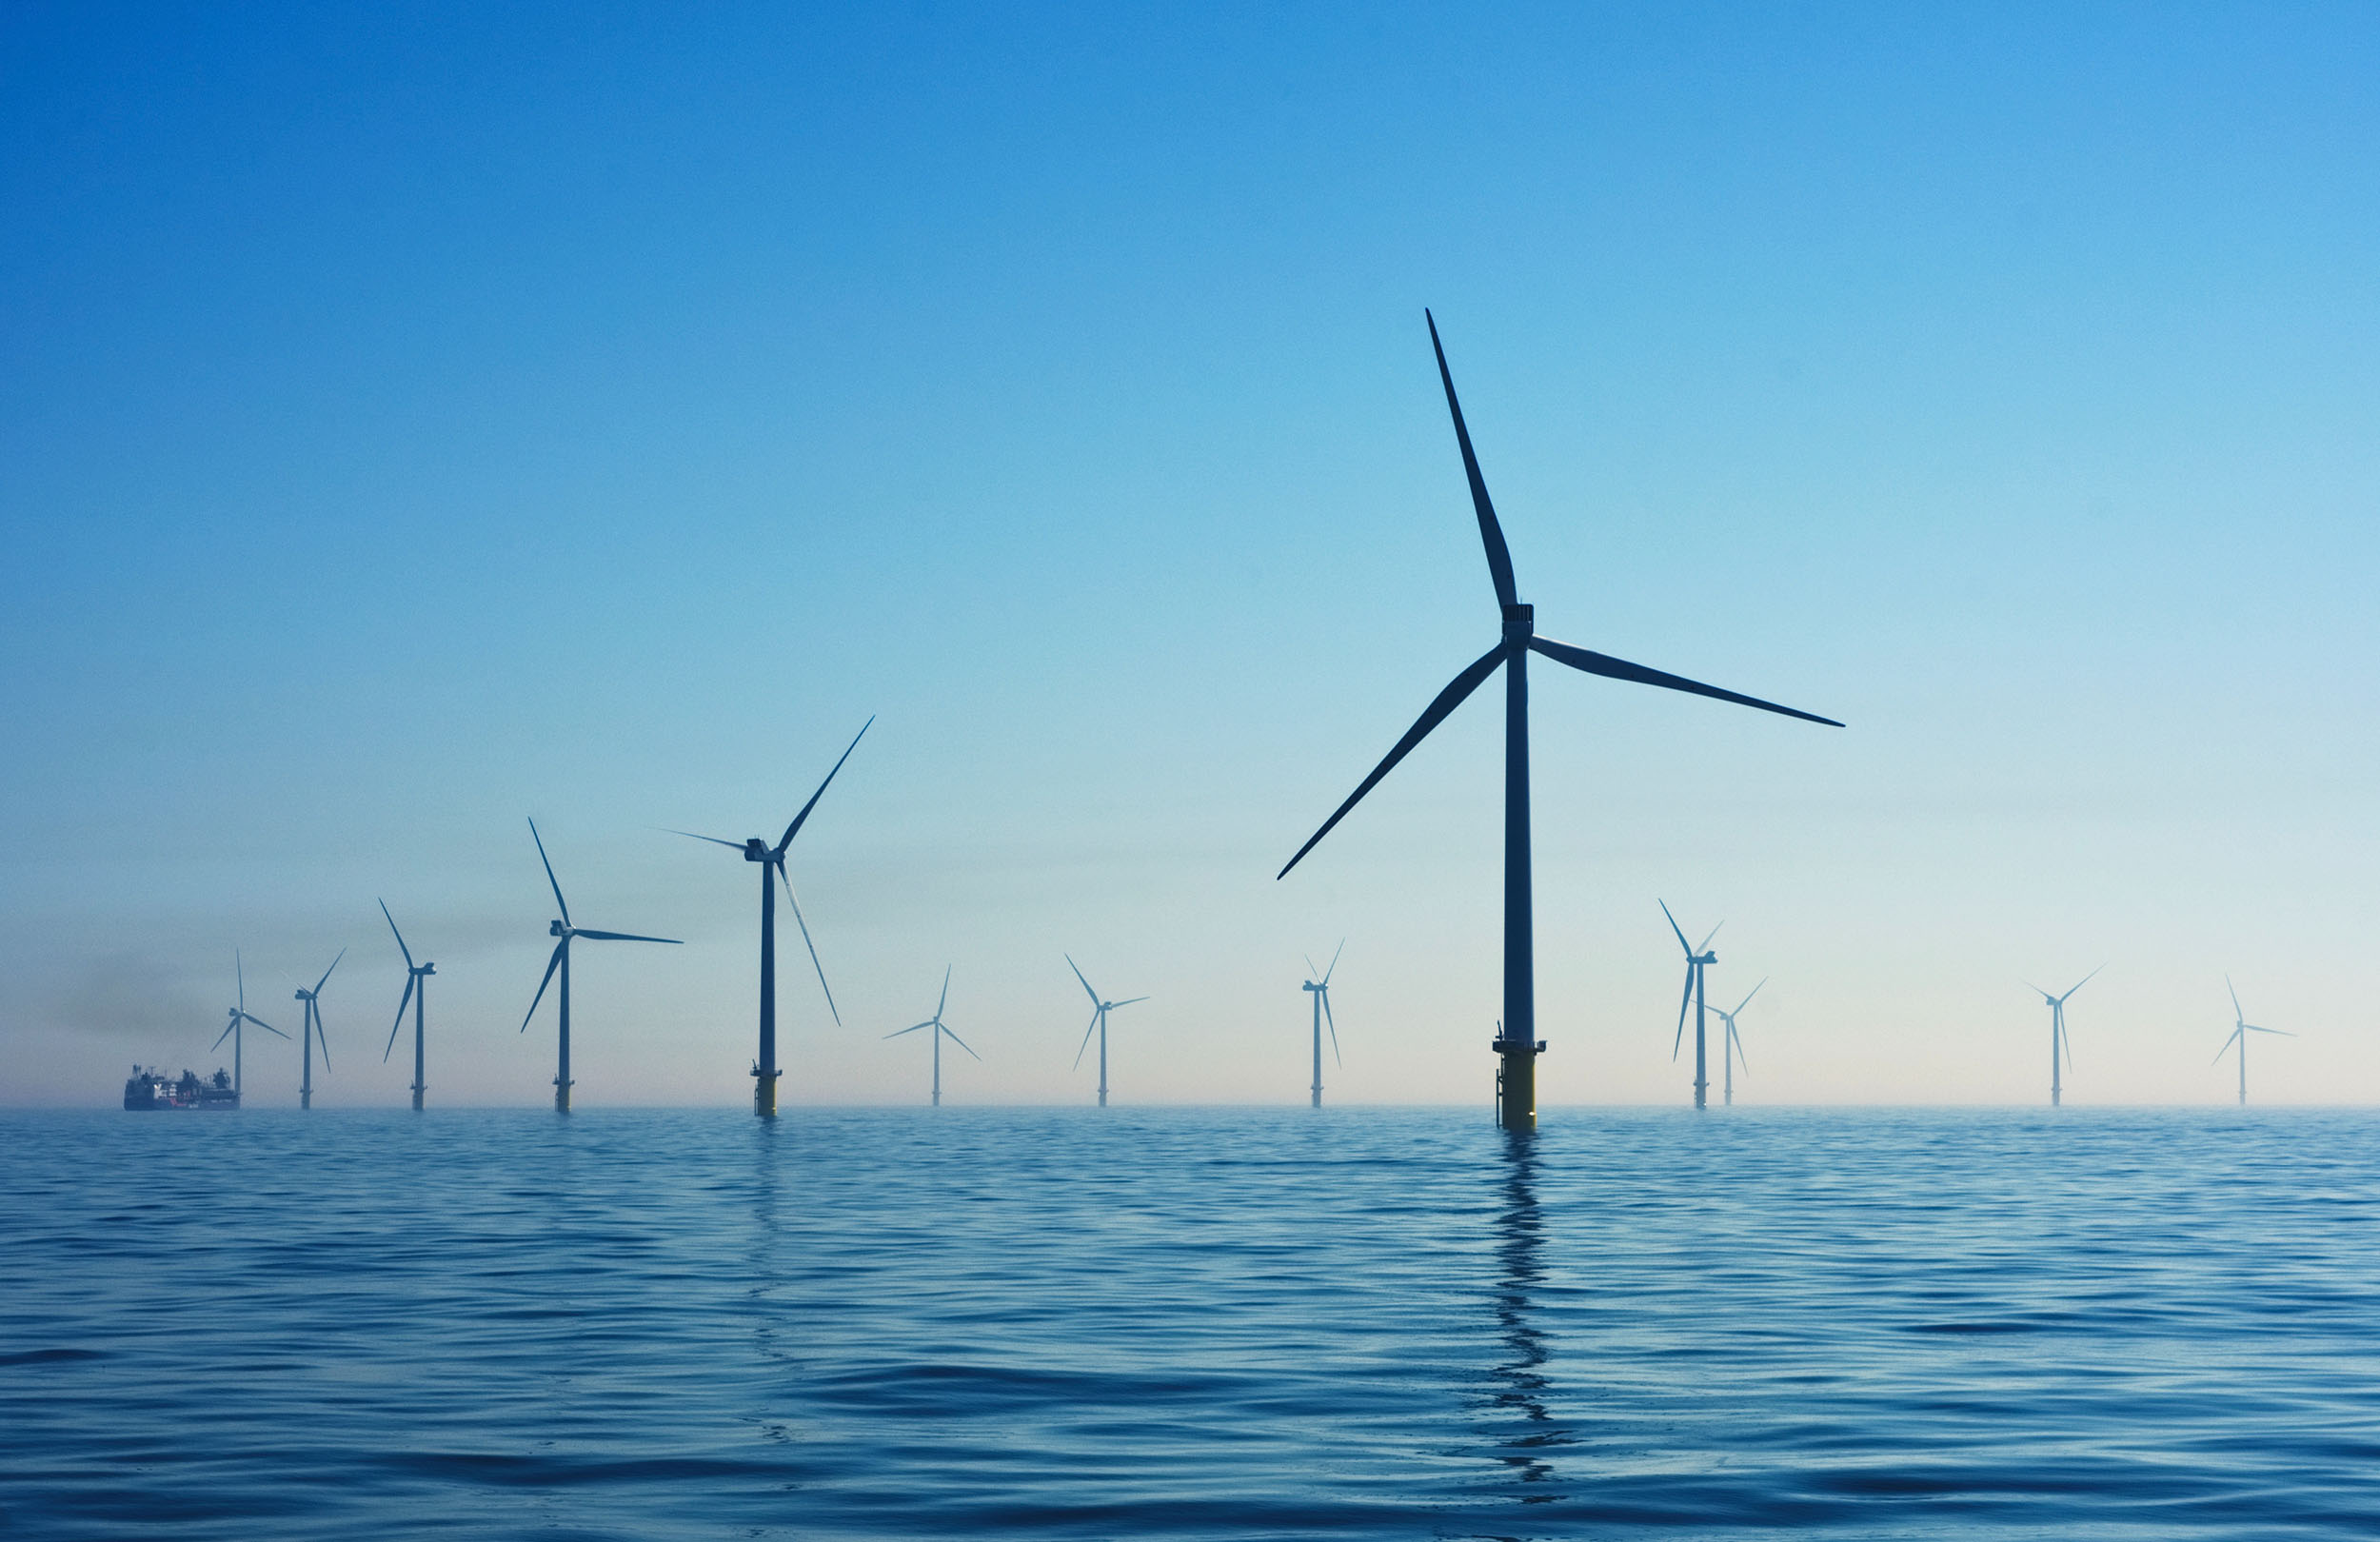 Low Carbon & Renewables_nicholas-doherty-pONBhDyOFoM-unsplash